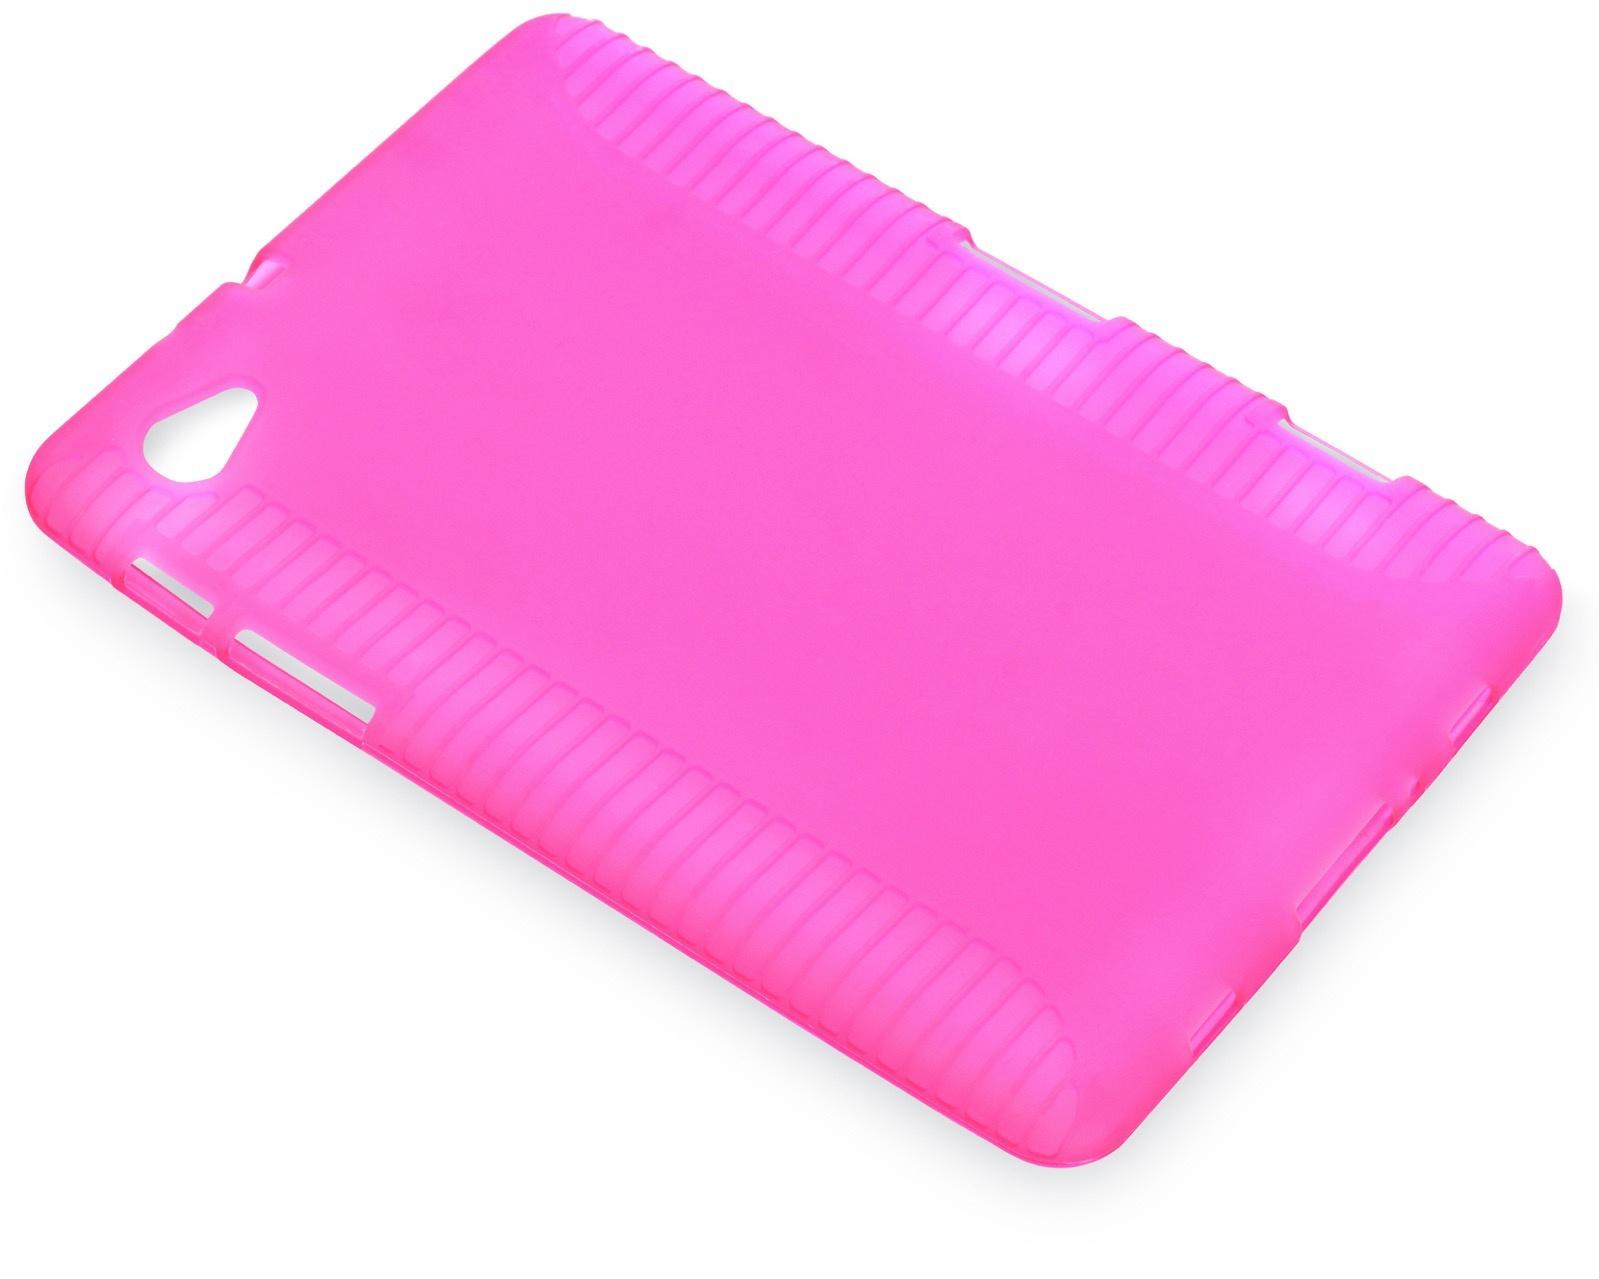 "Чехол для планшета iNeez накладка силикон 340105 для Samsung Tab 7.7"", розовый"